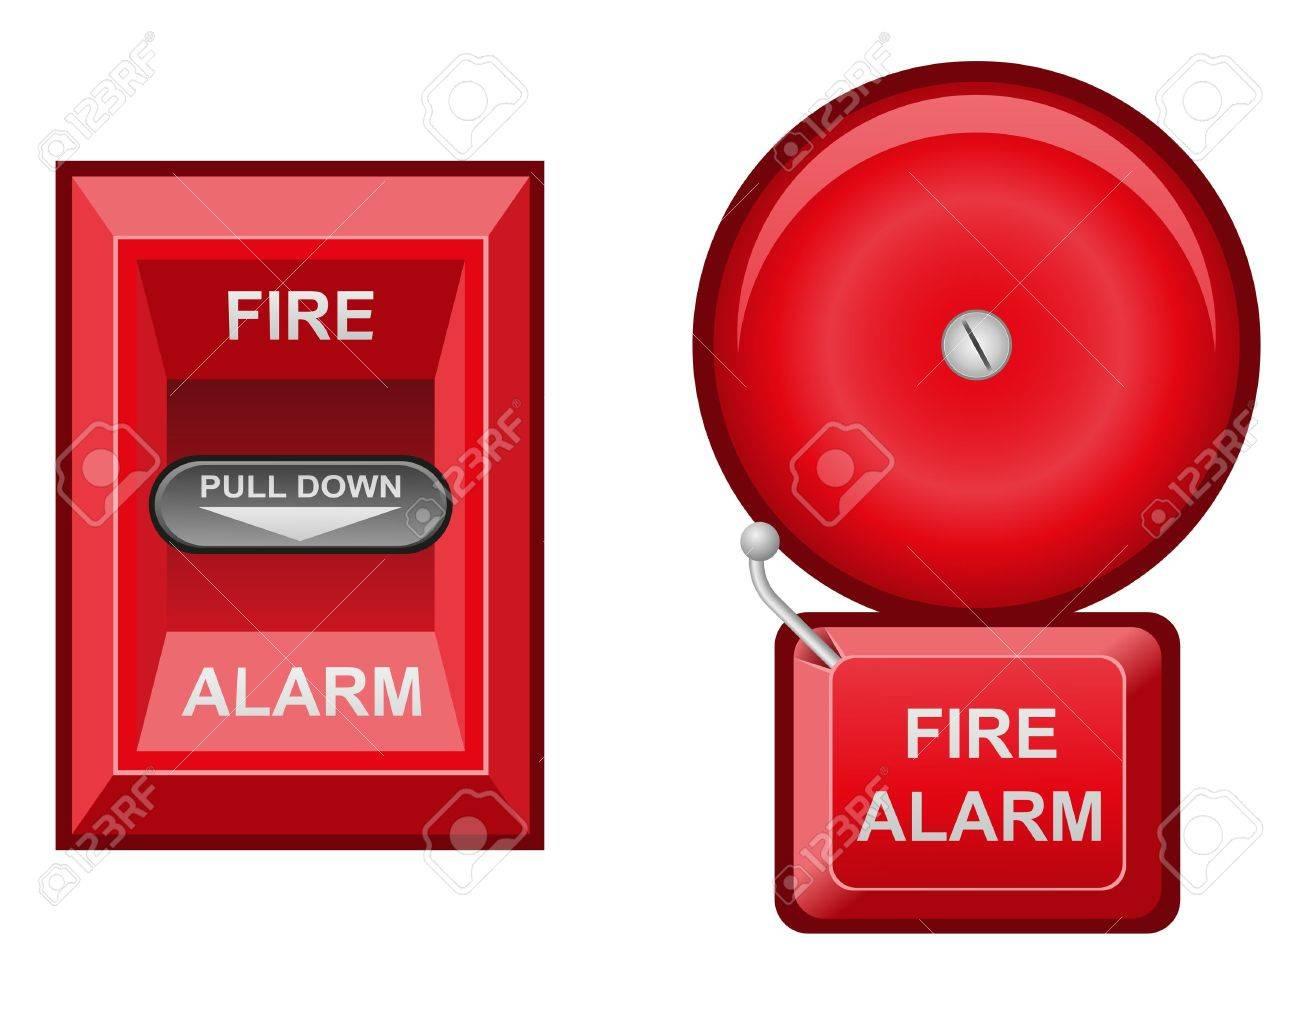 fire alarm vector illustration isolated on white background Stock Illustration - 15801005